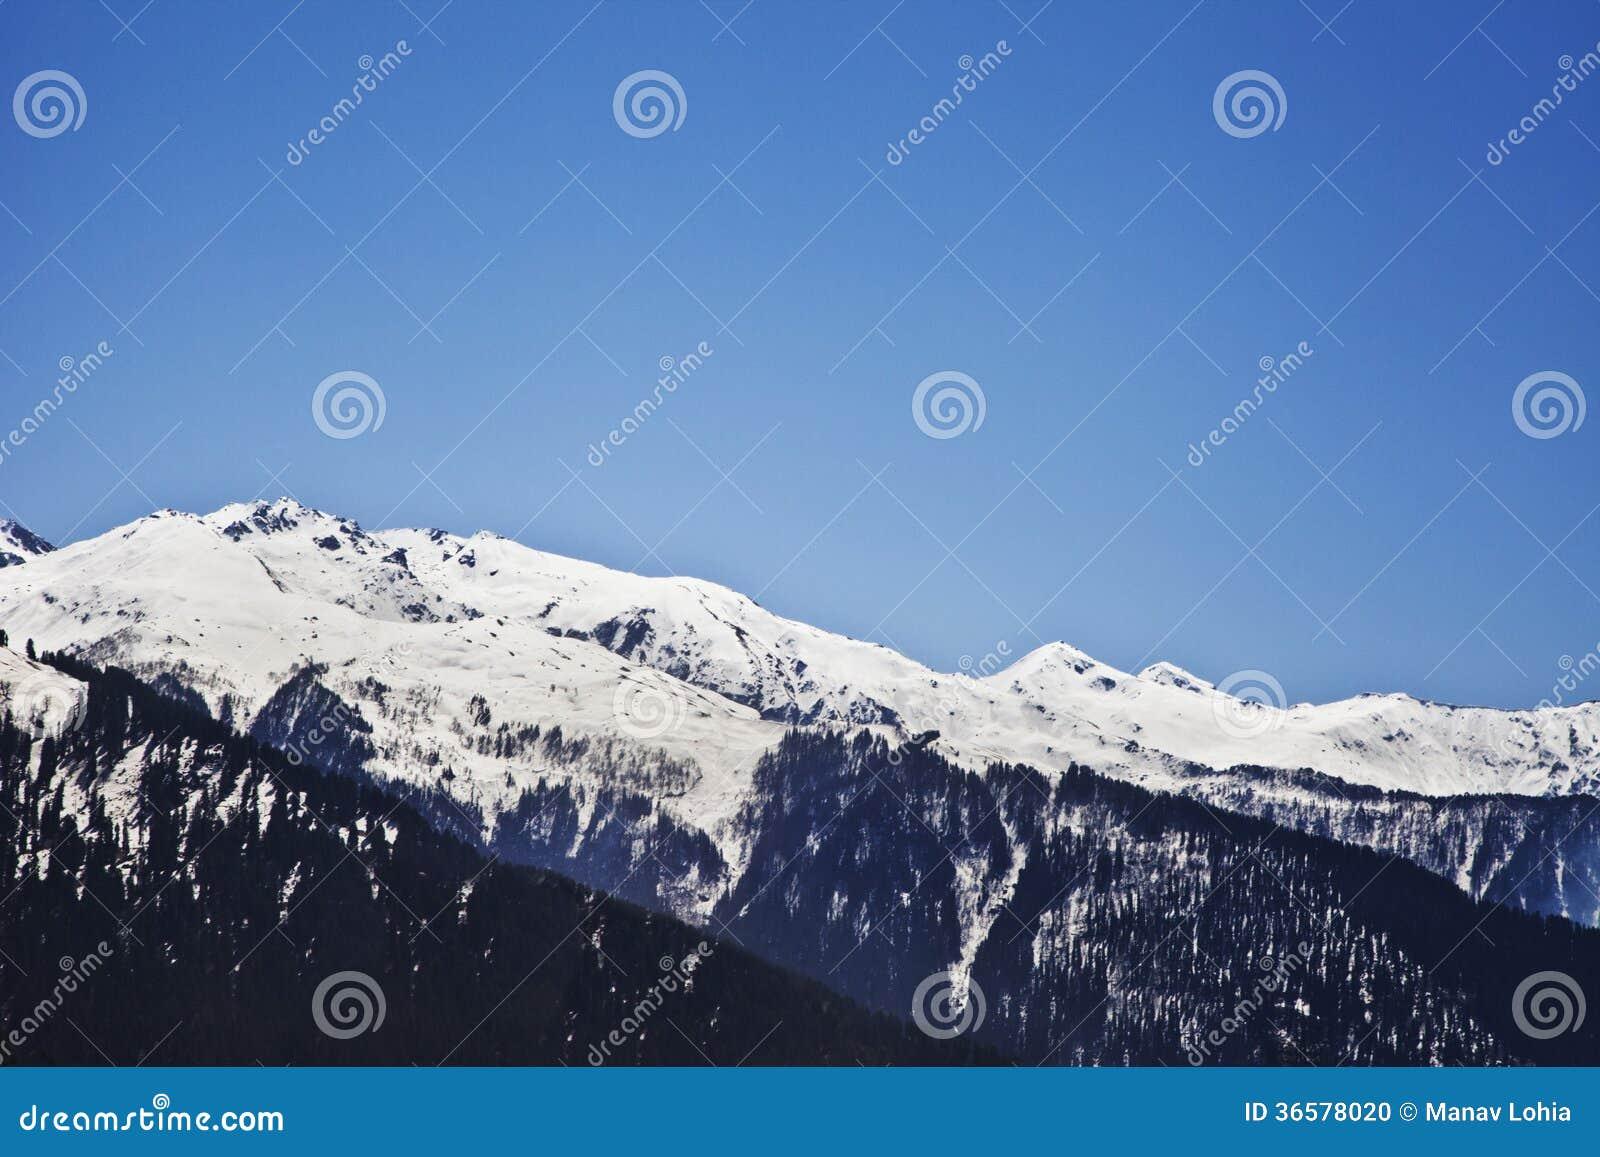 Snowcapped mountain range manali himachal pradesh india stock photo